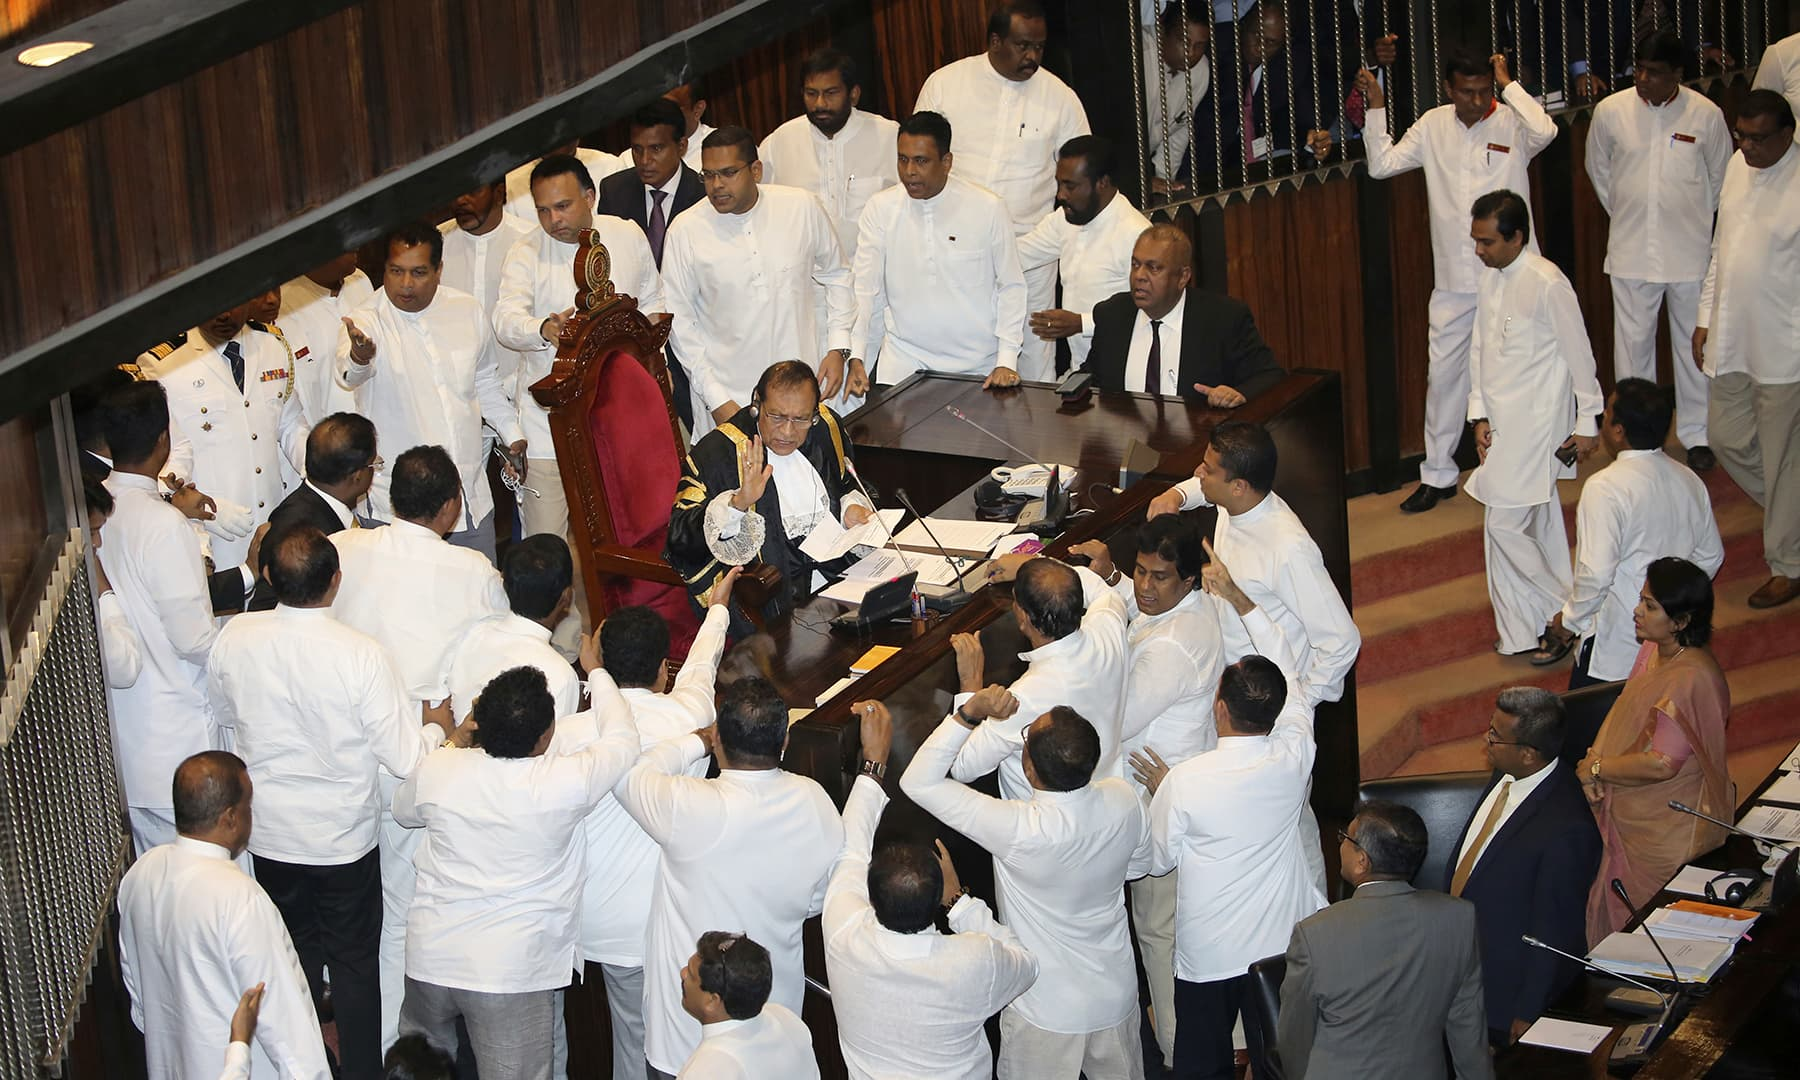 Sri Lankan Lawmakers surround speaker Kaku Jayasuriya during a session at the parliament chamber in Colombo, Sri Lanka, Thursday, November 15, 2018. —AP